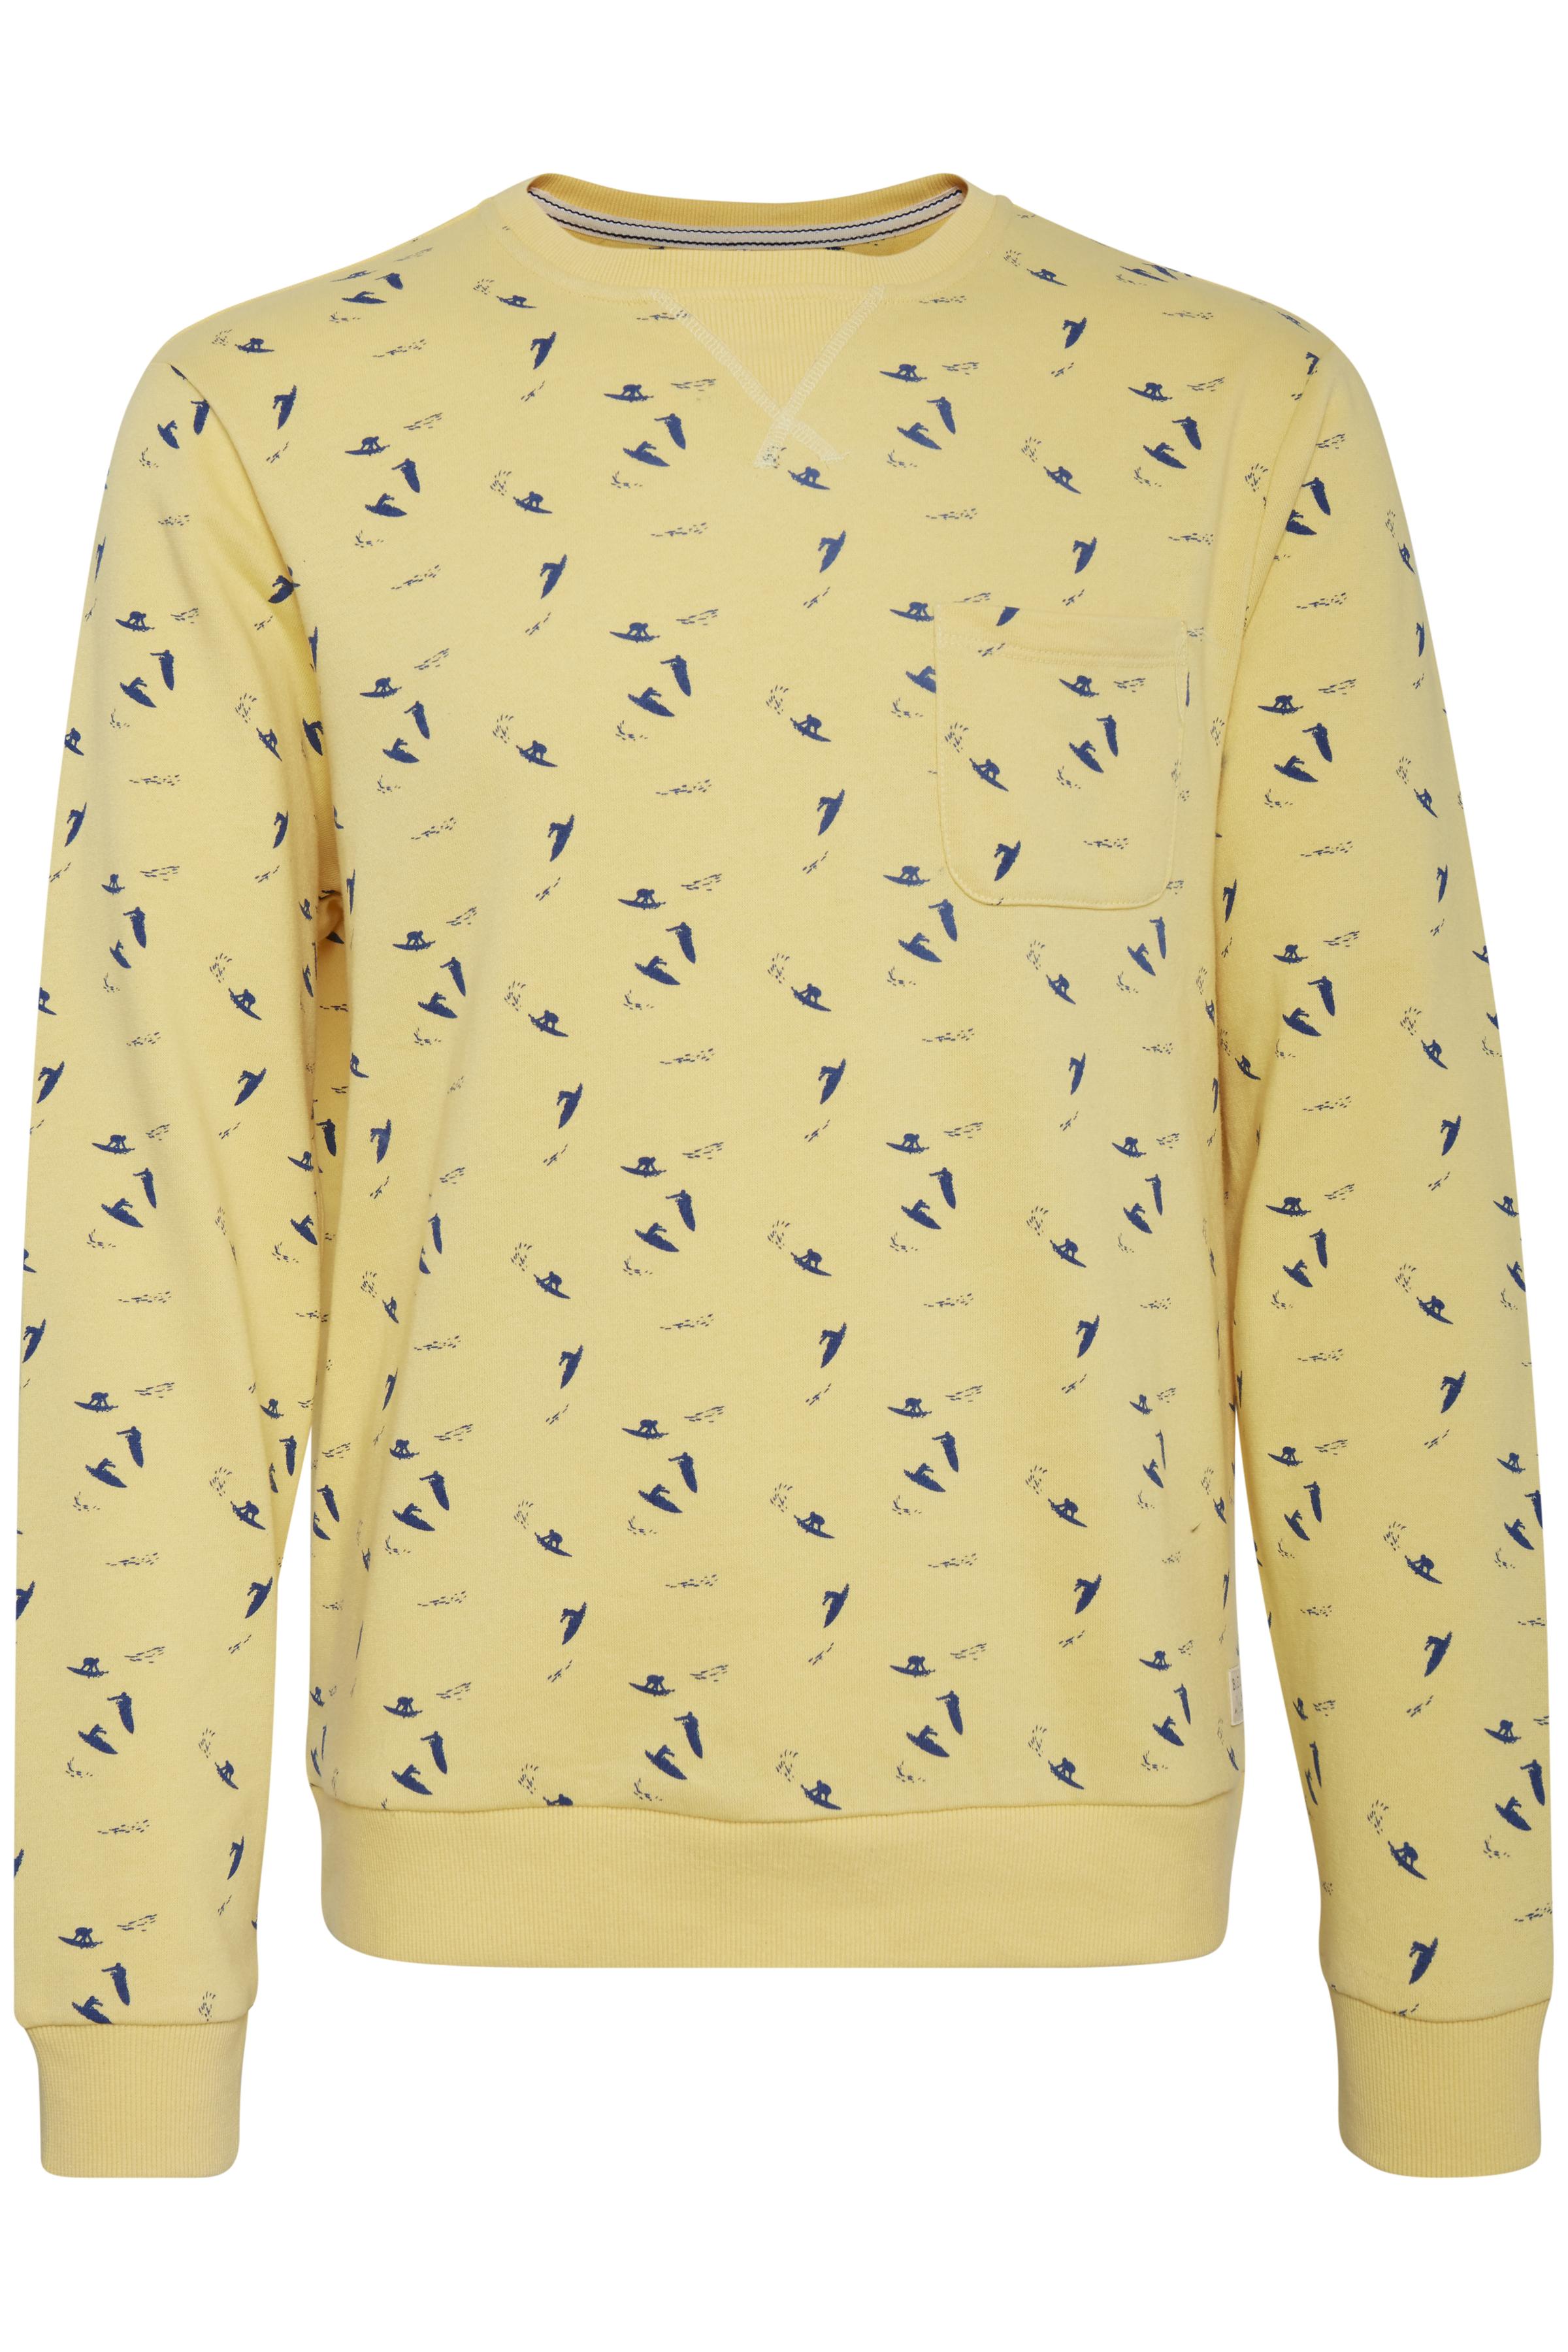 Lemon Drop Sweatshirt – Køb Lemon Drop Sweatshirt fra str. S-XL her